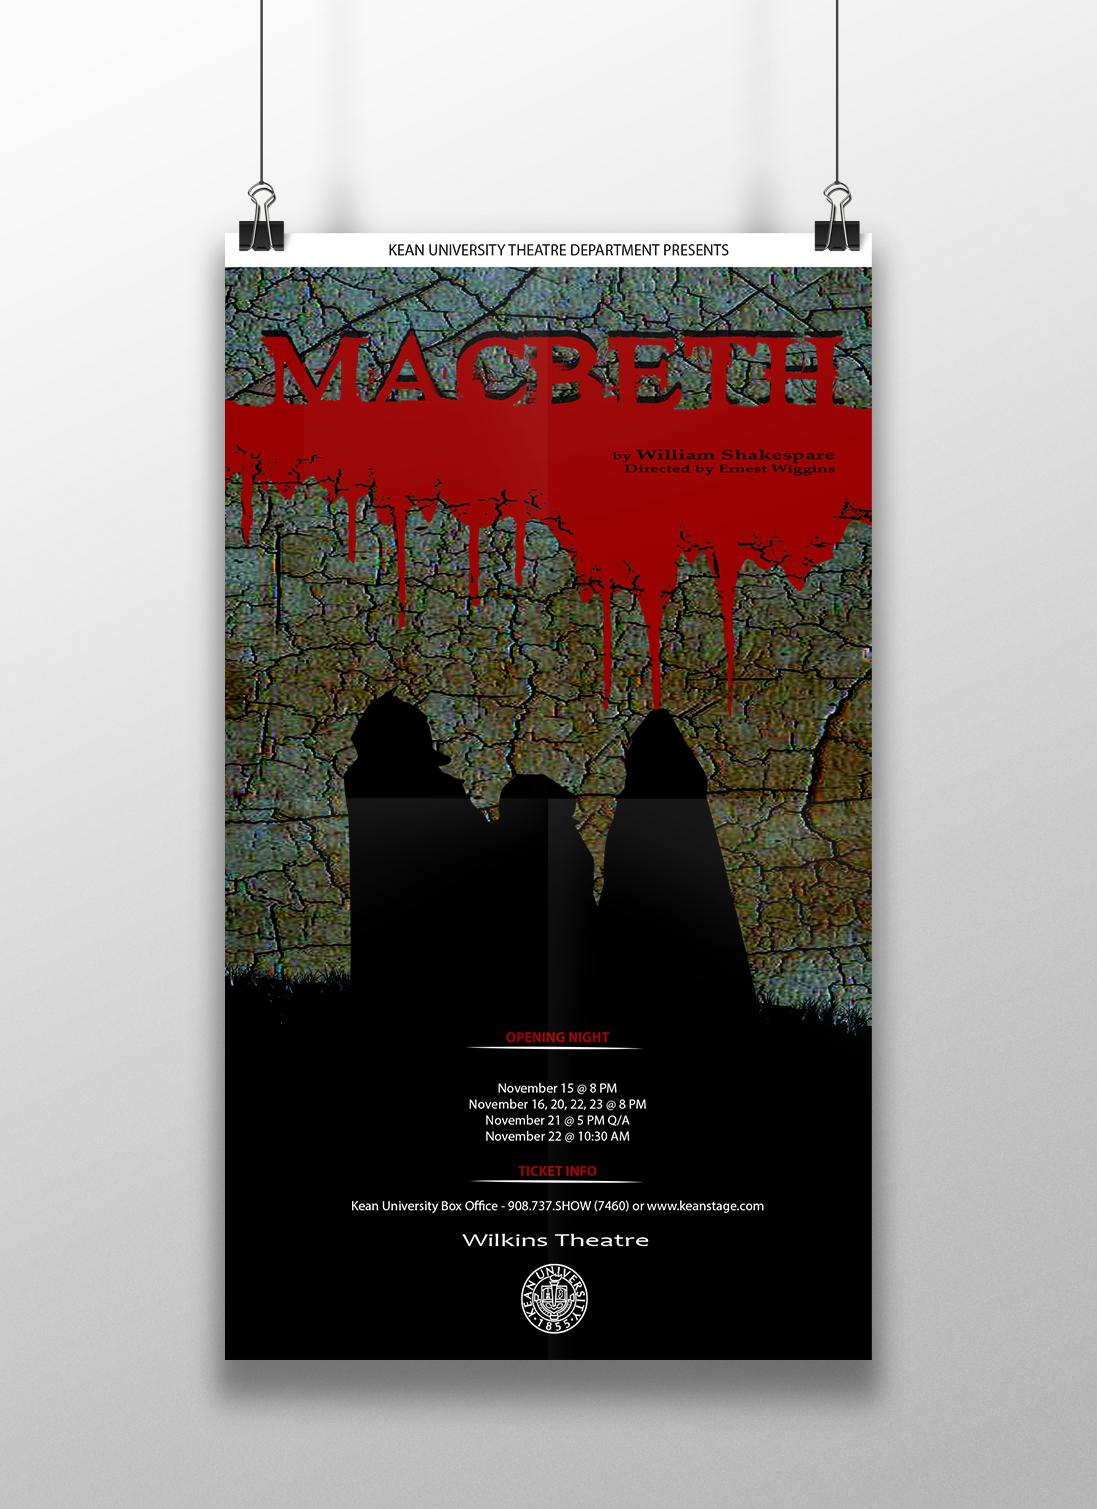 Poster Designs on Behance